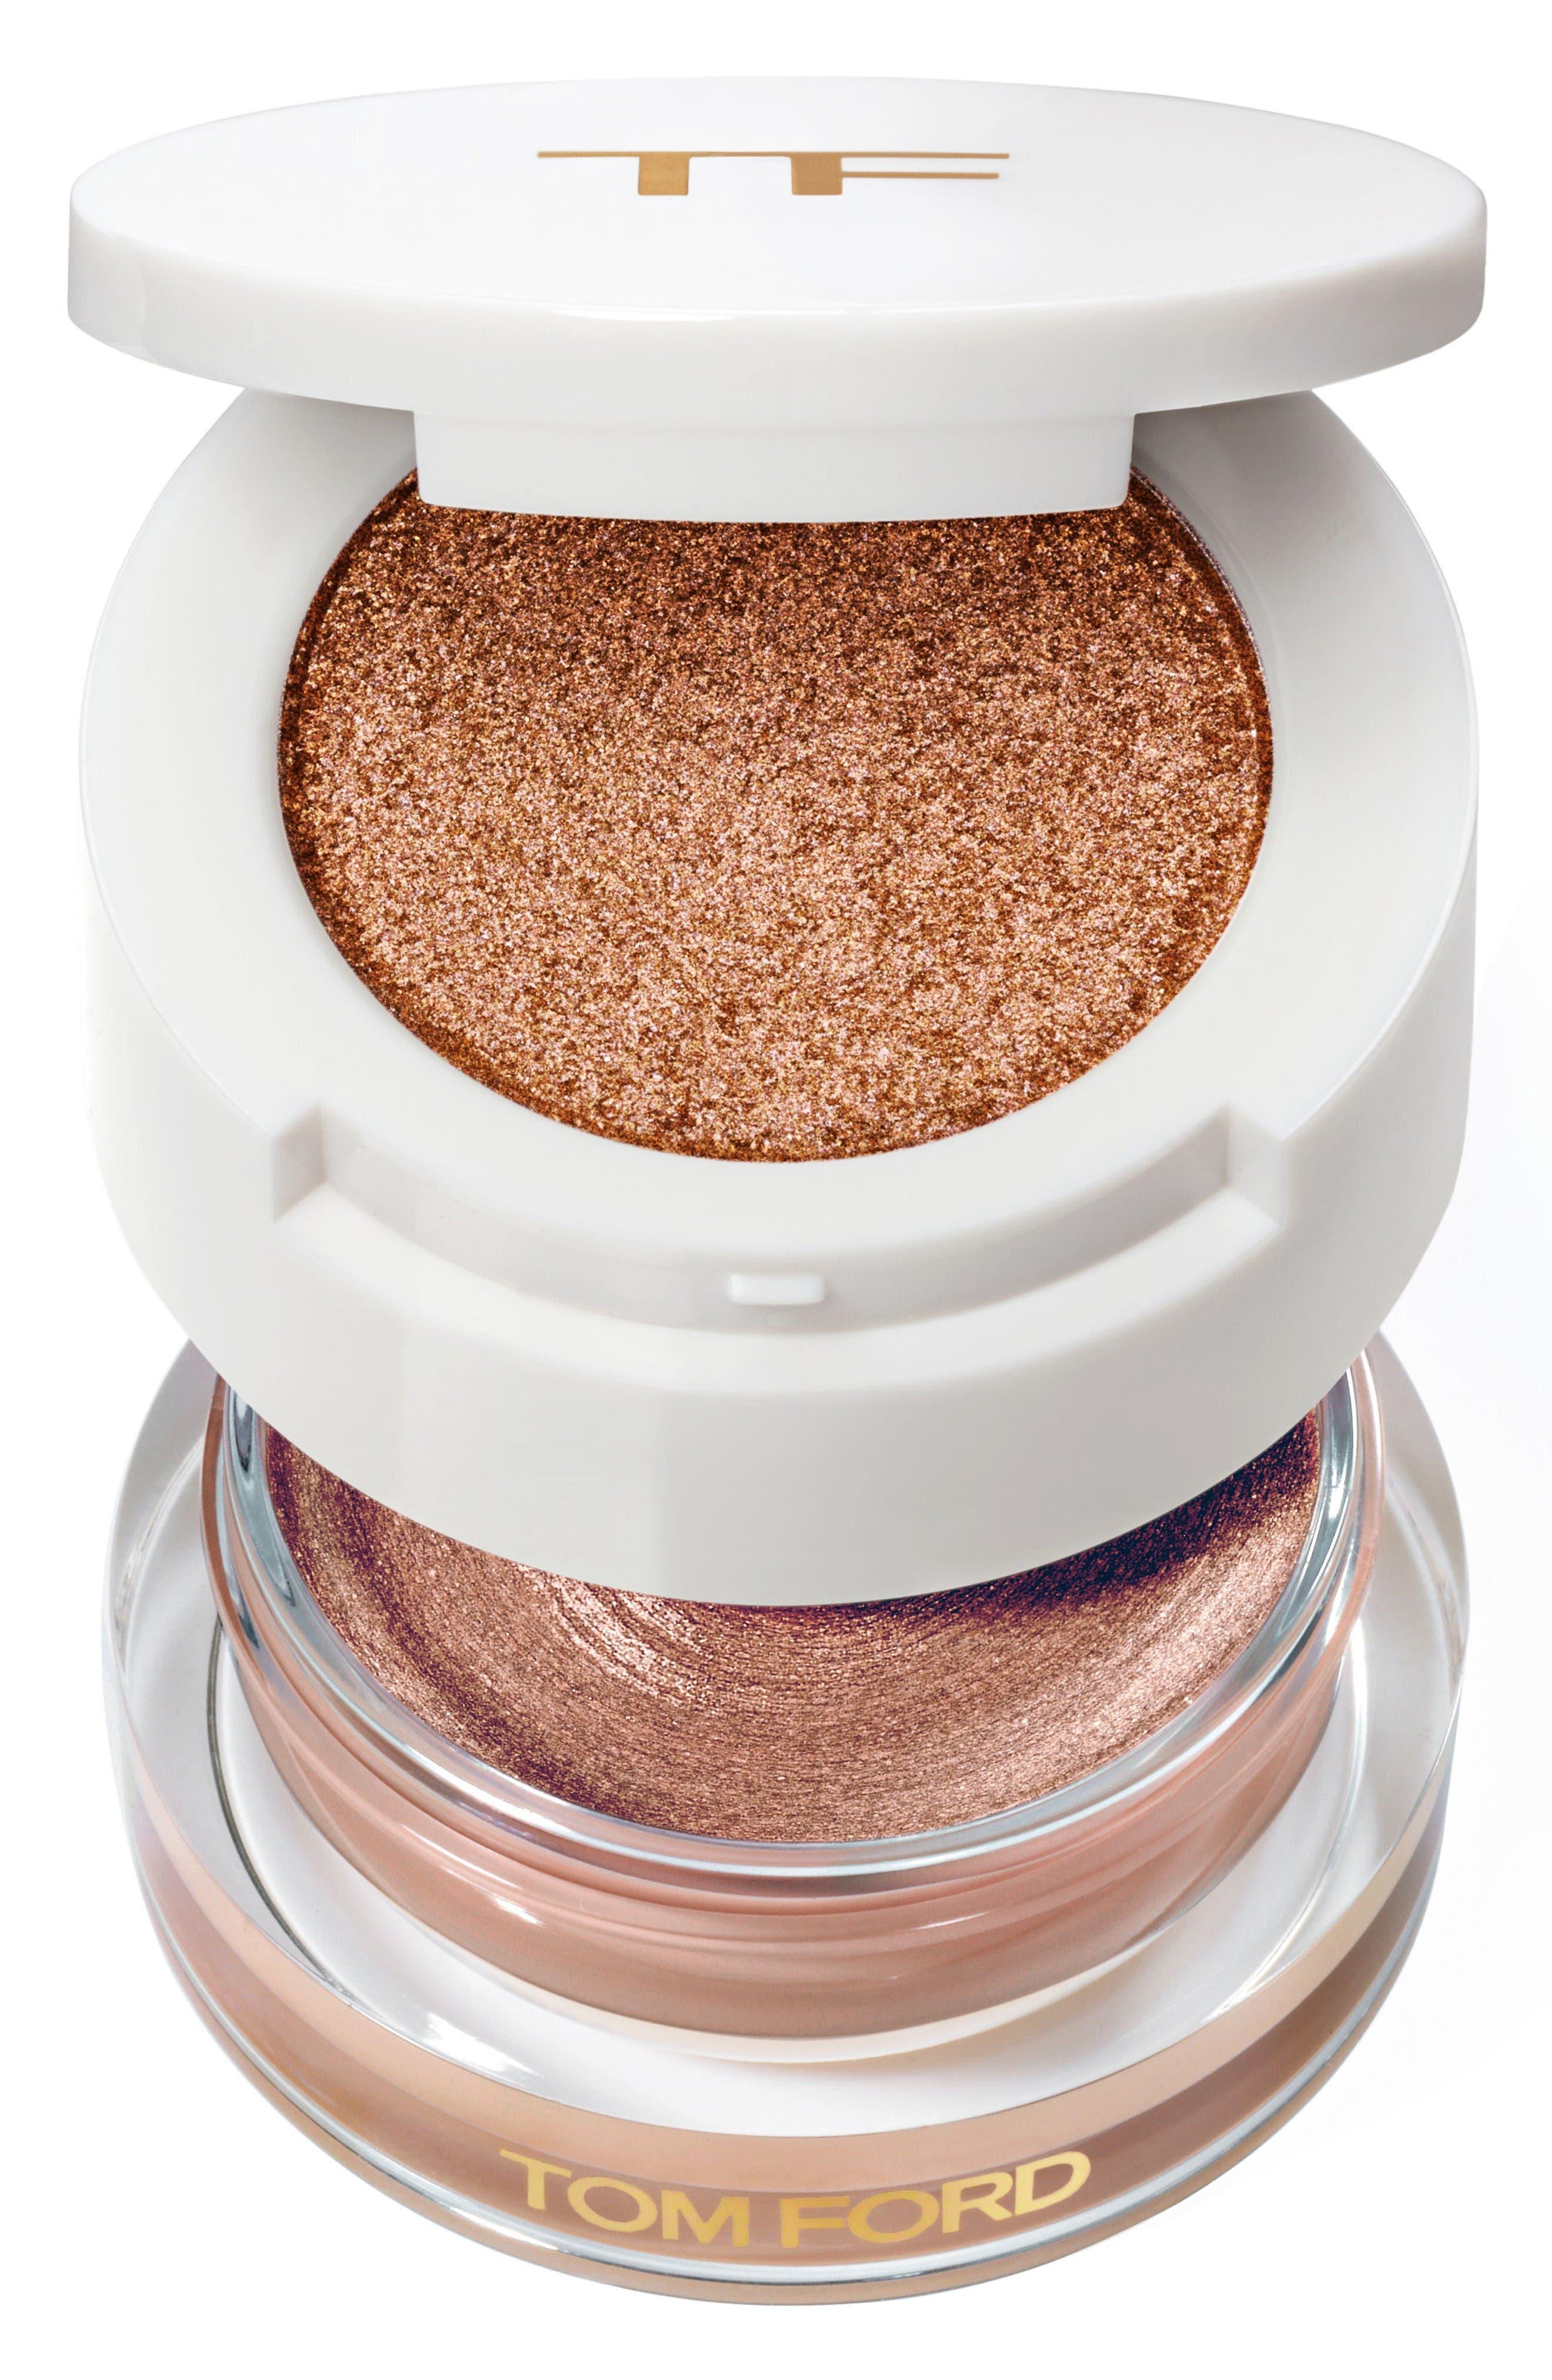 Tom Ford Cream & Powder Eye Color Duo